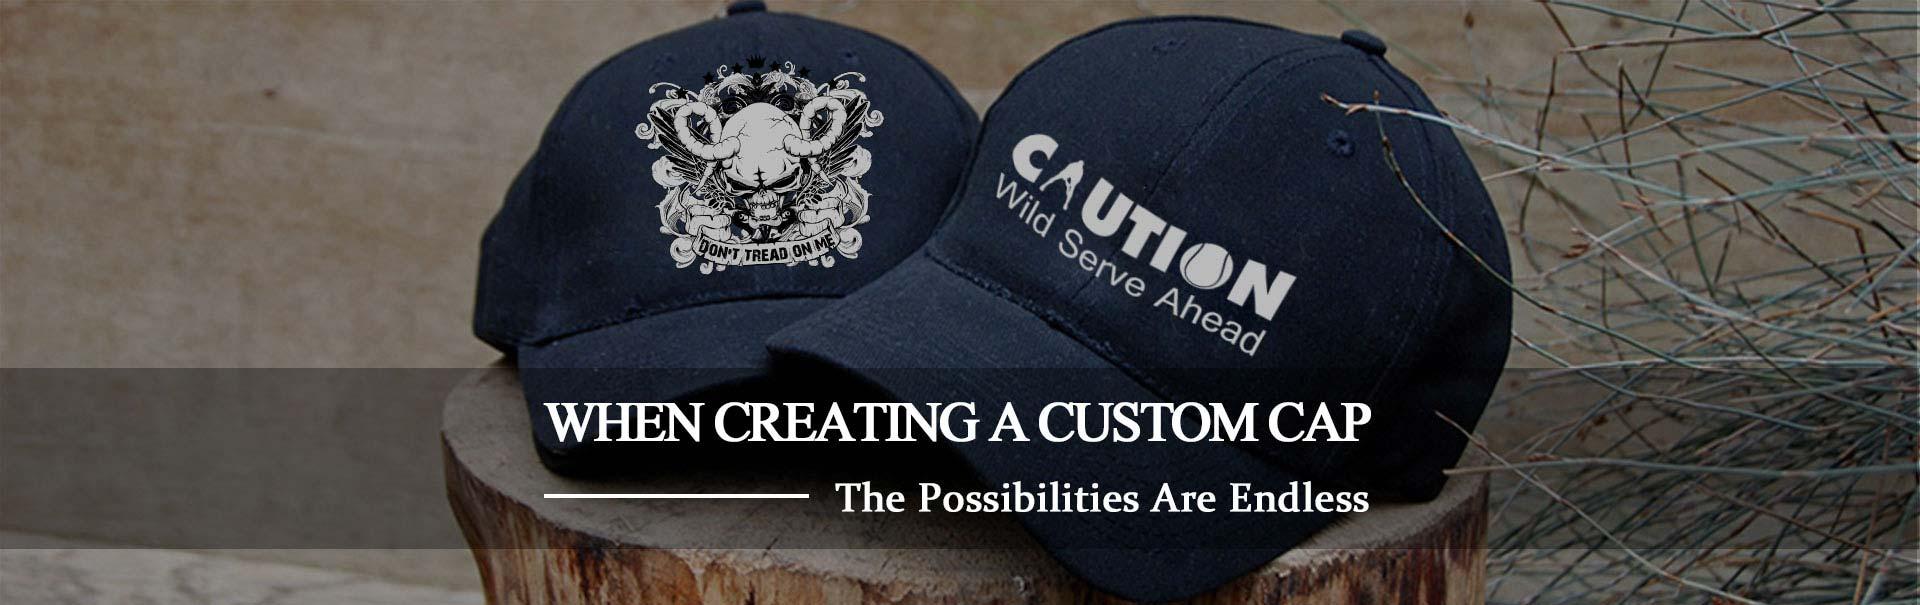 Custom Printed Hats - ThirdStyle Forum 735d46cd5c1